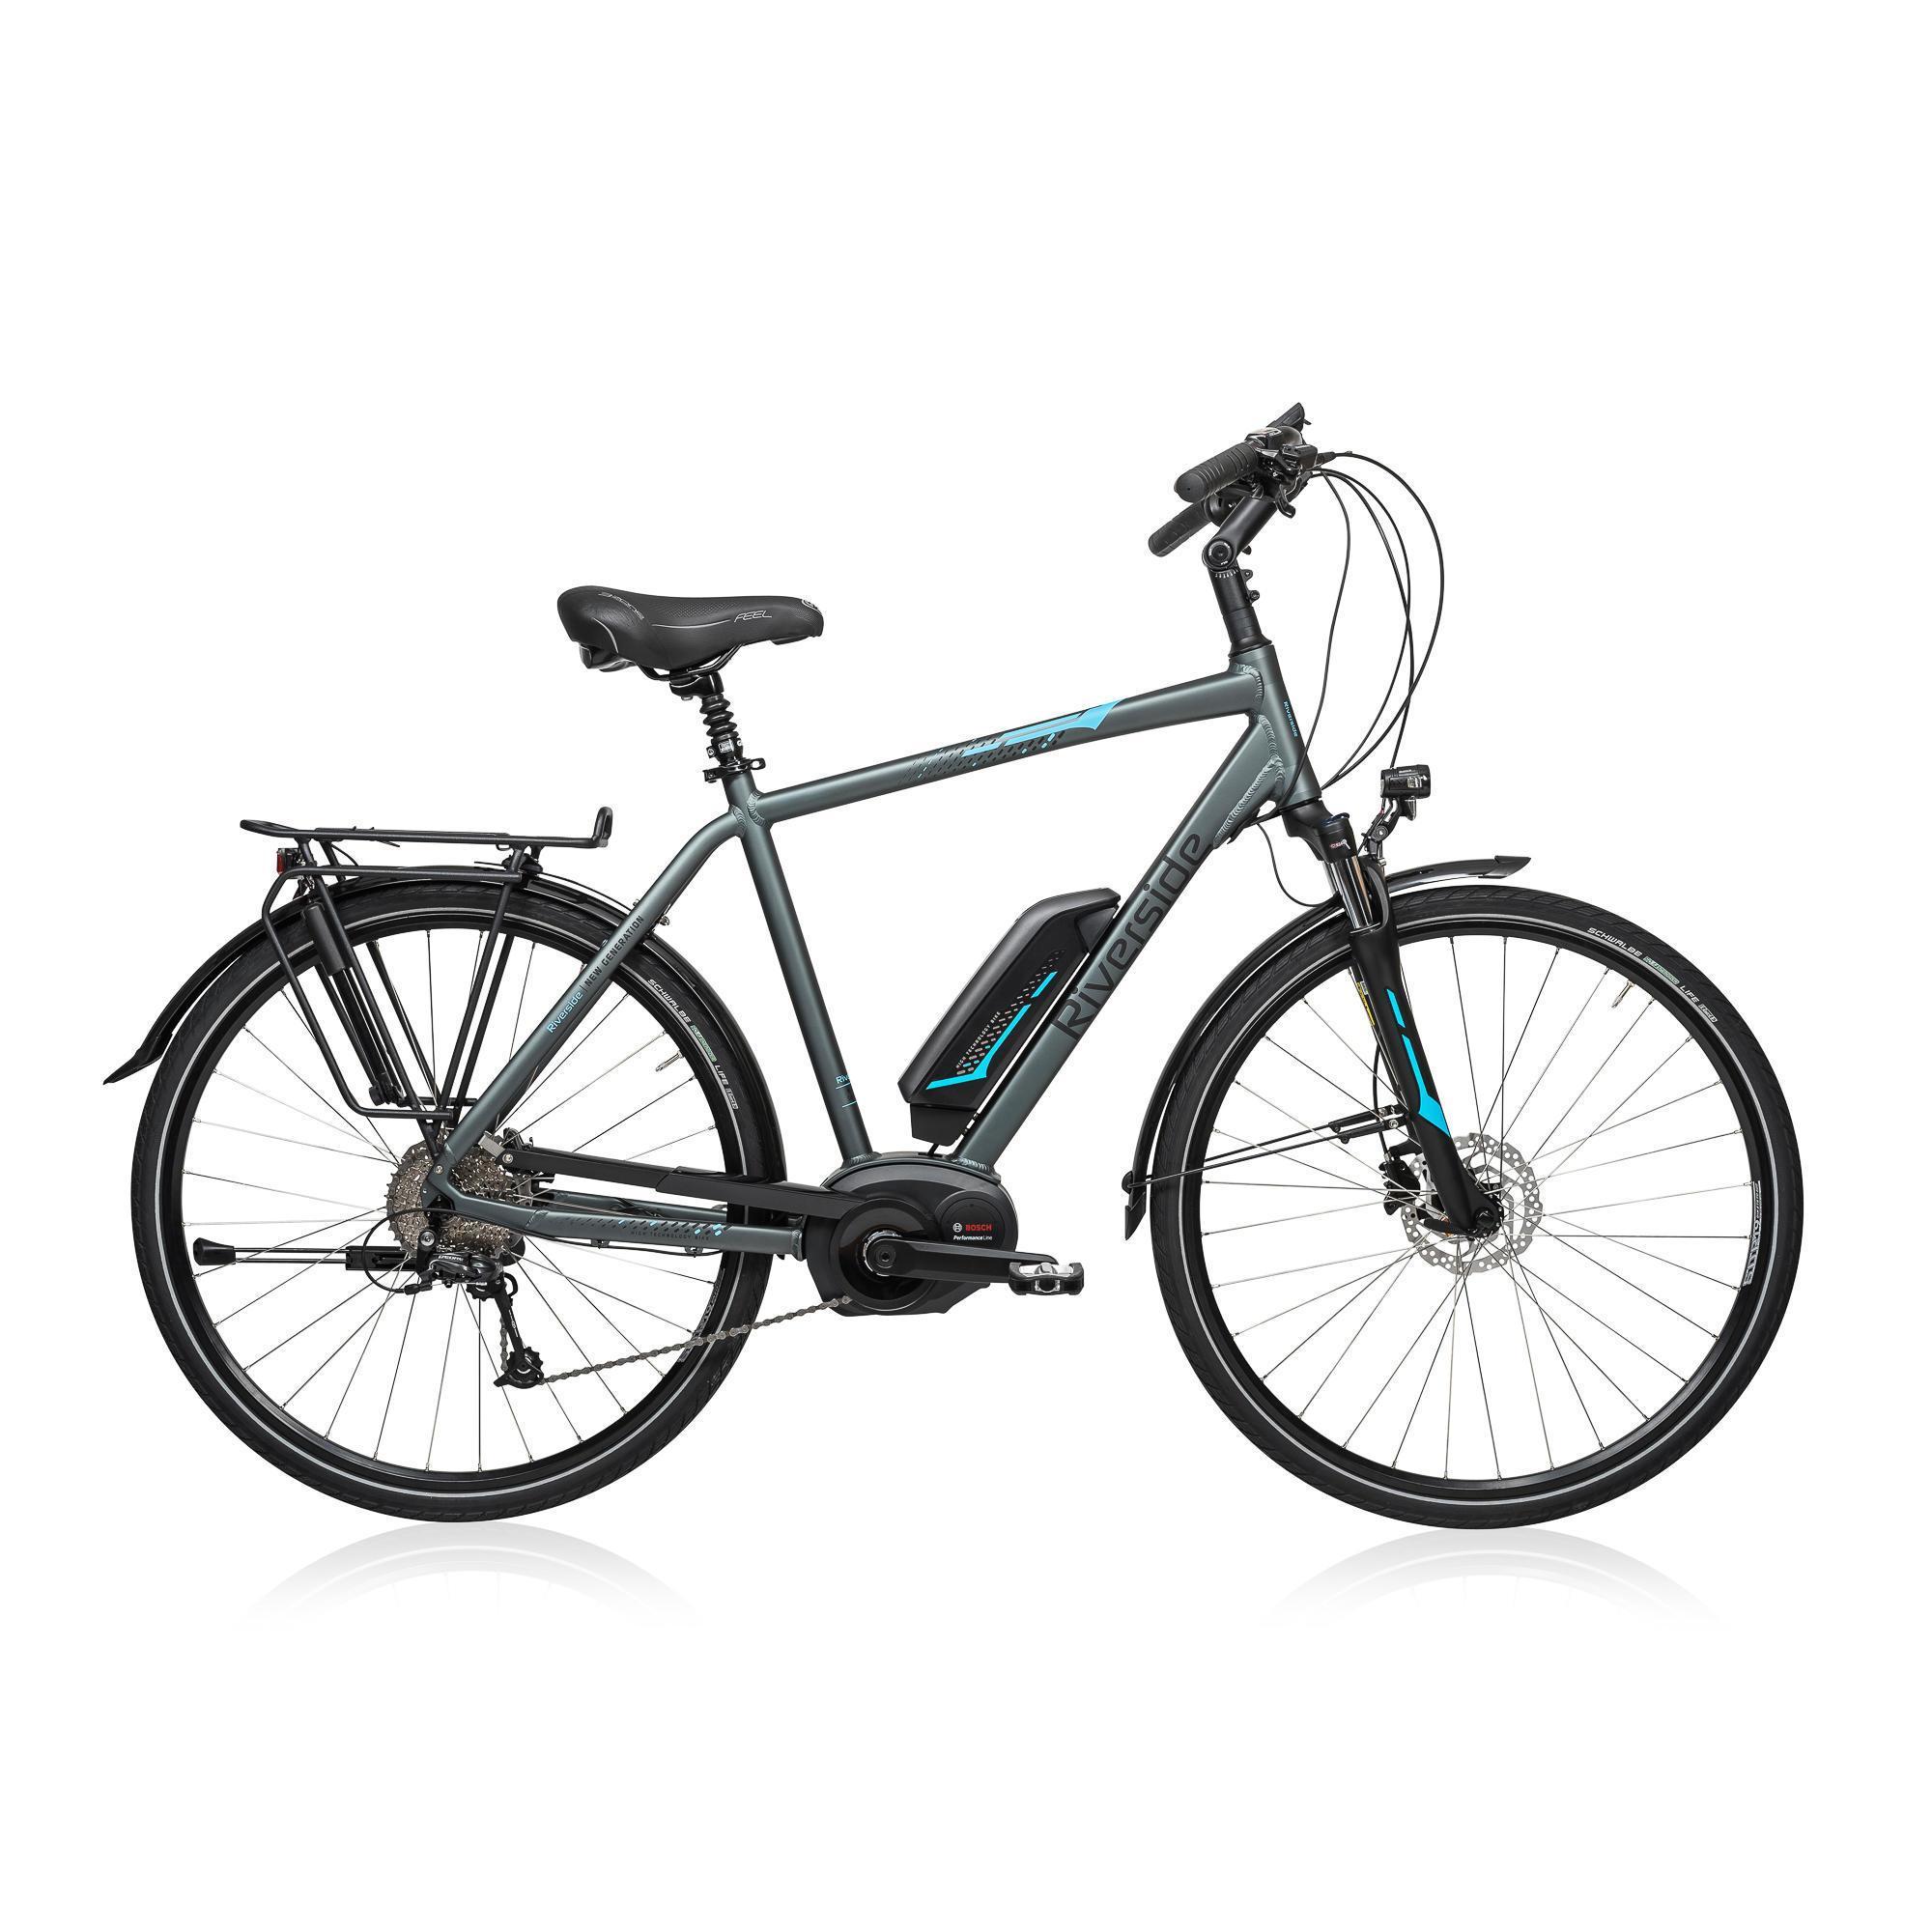 Riverside 28 Zoll Trekking Bosch E-Bike Pedelec Online und Lokal